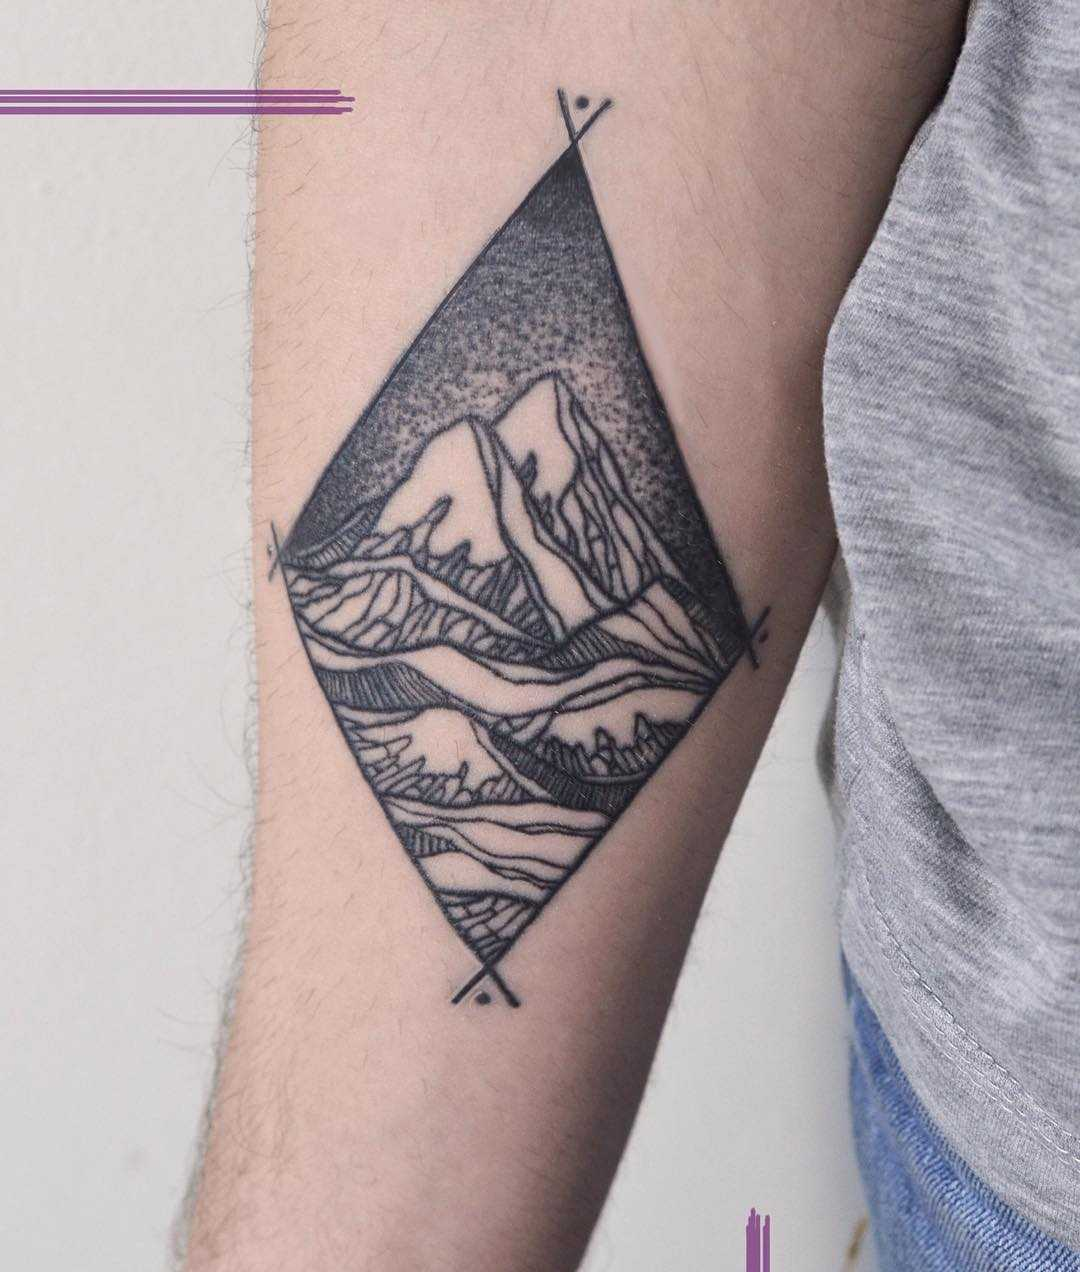 Rhombus-shaped mountain landscape tattoo